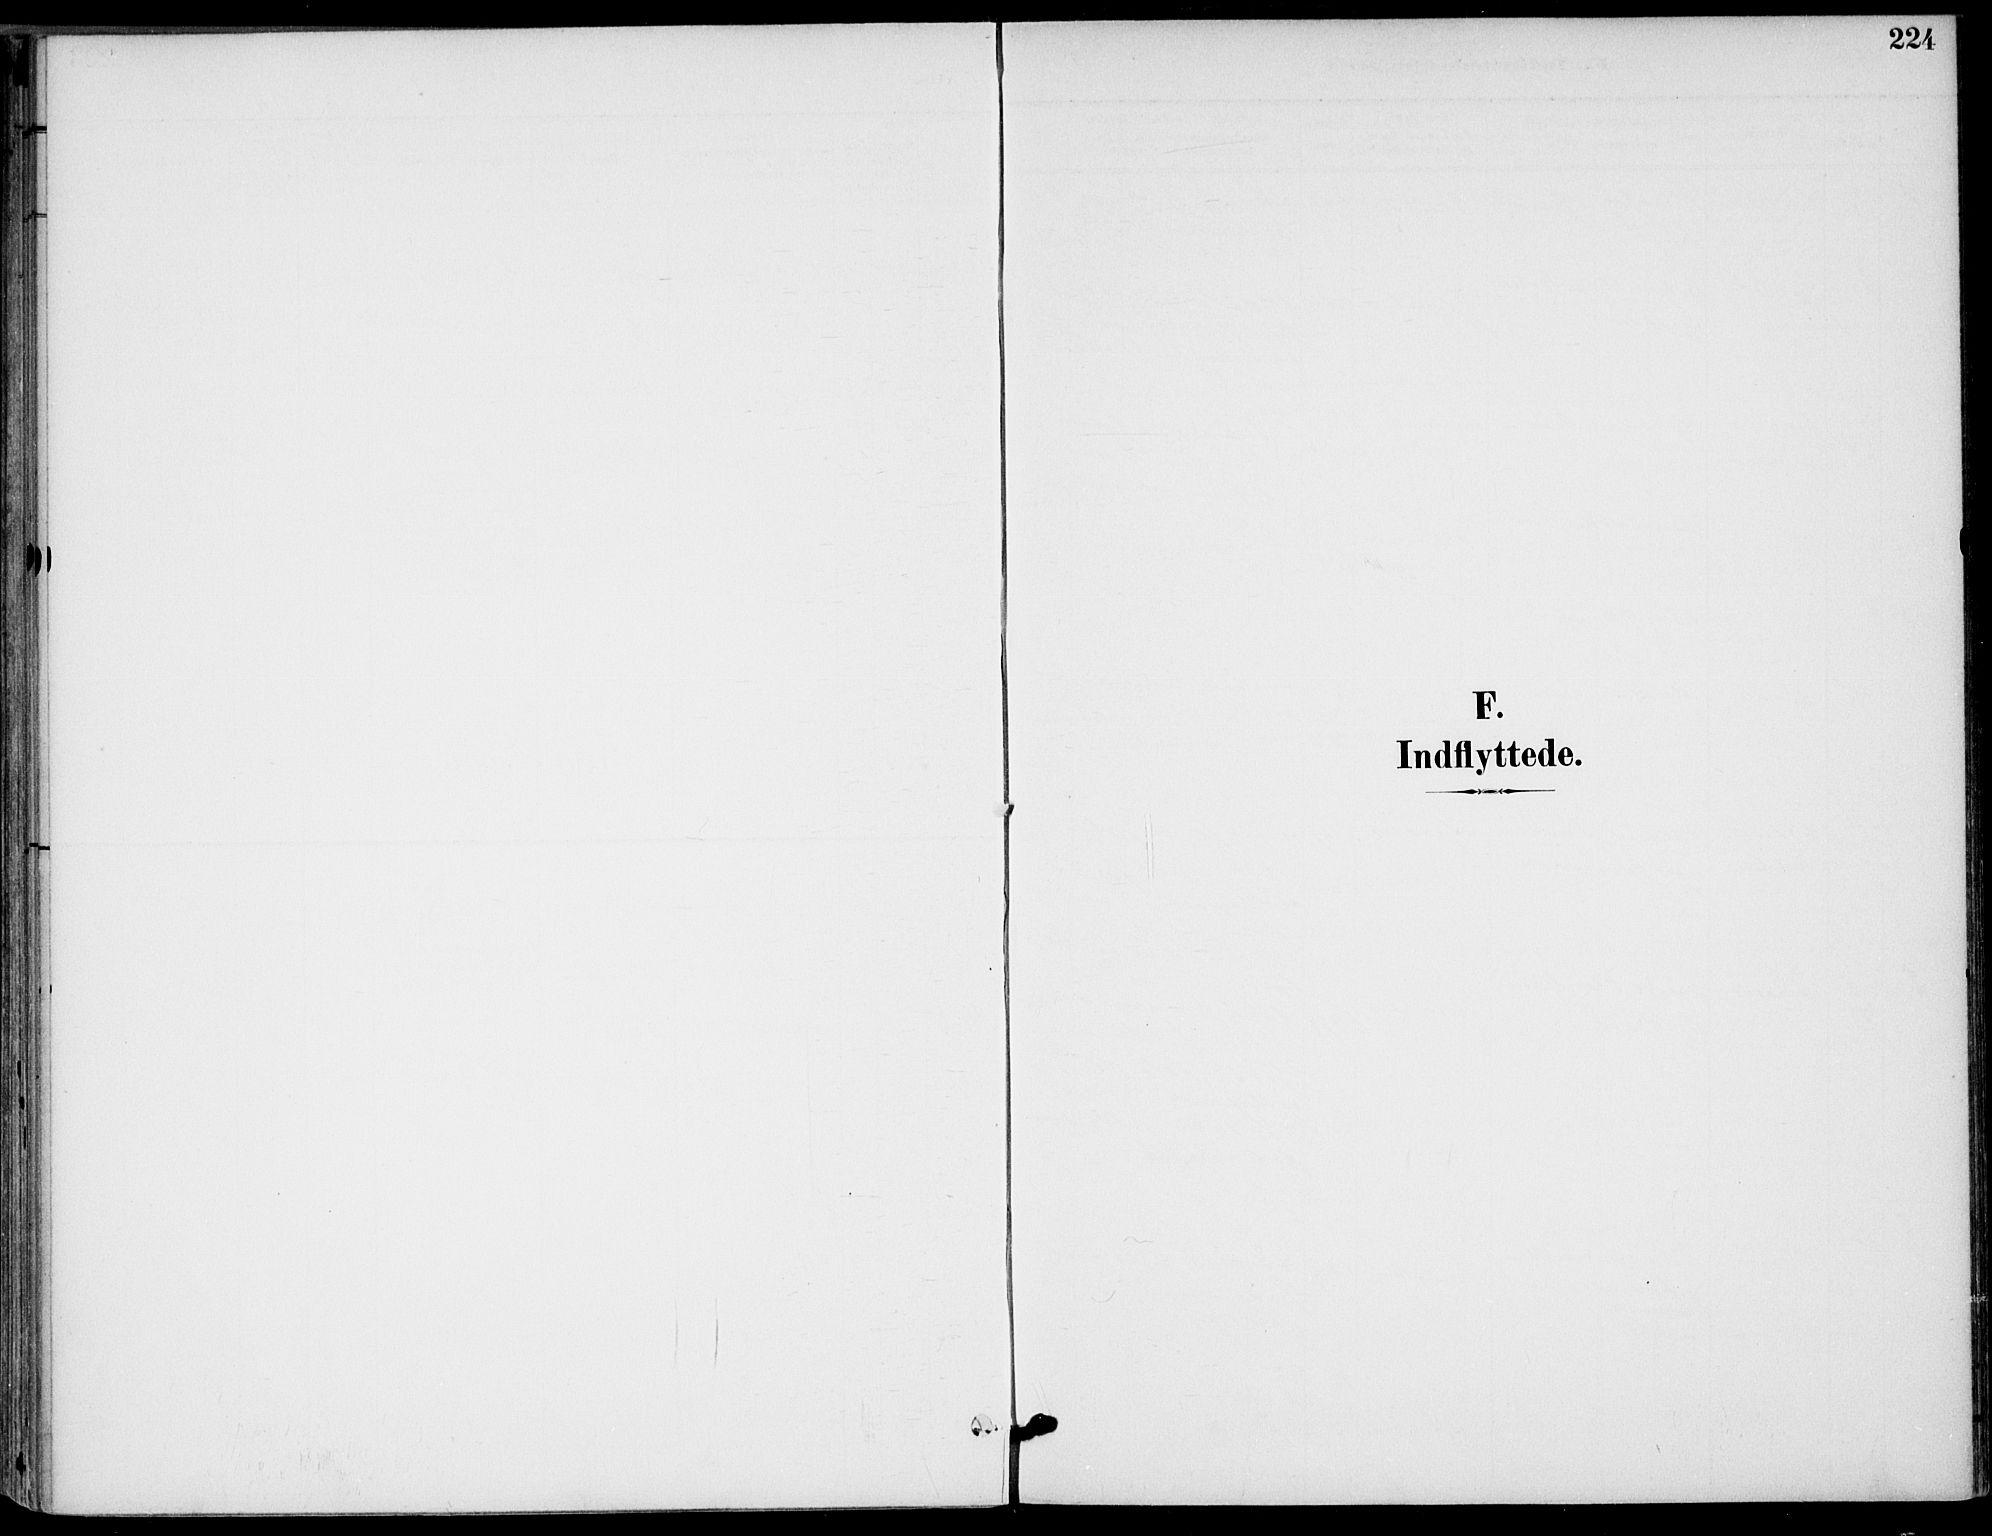 SAKO, Drangedal kirkebøker, F/Fa/L0012: Ministerialbok nr. 12, 1895-1905, s. 224